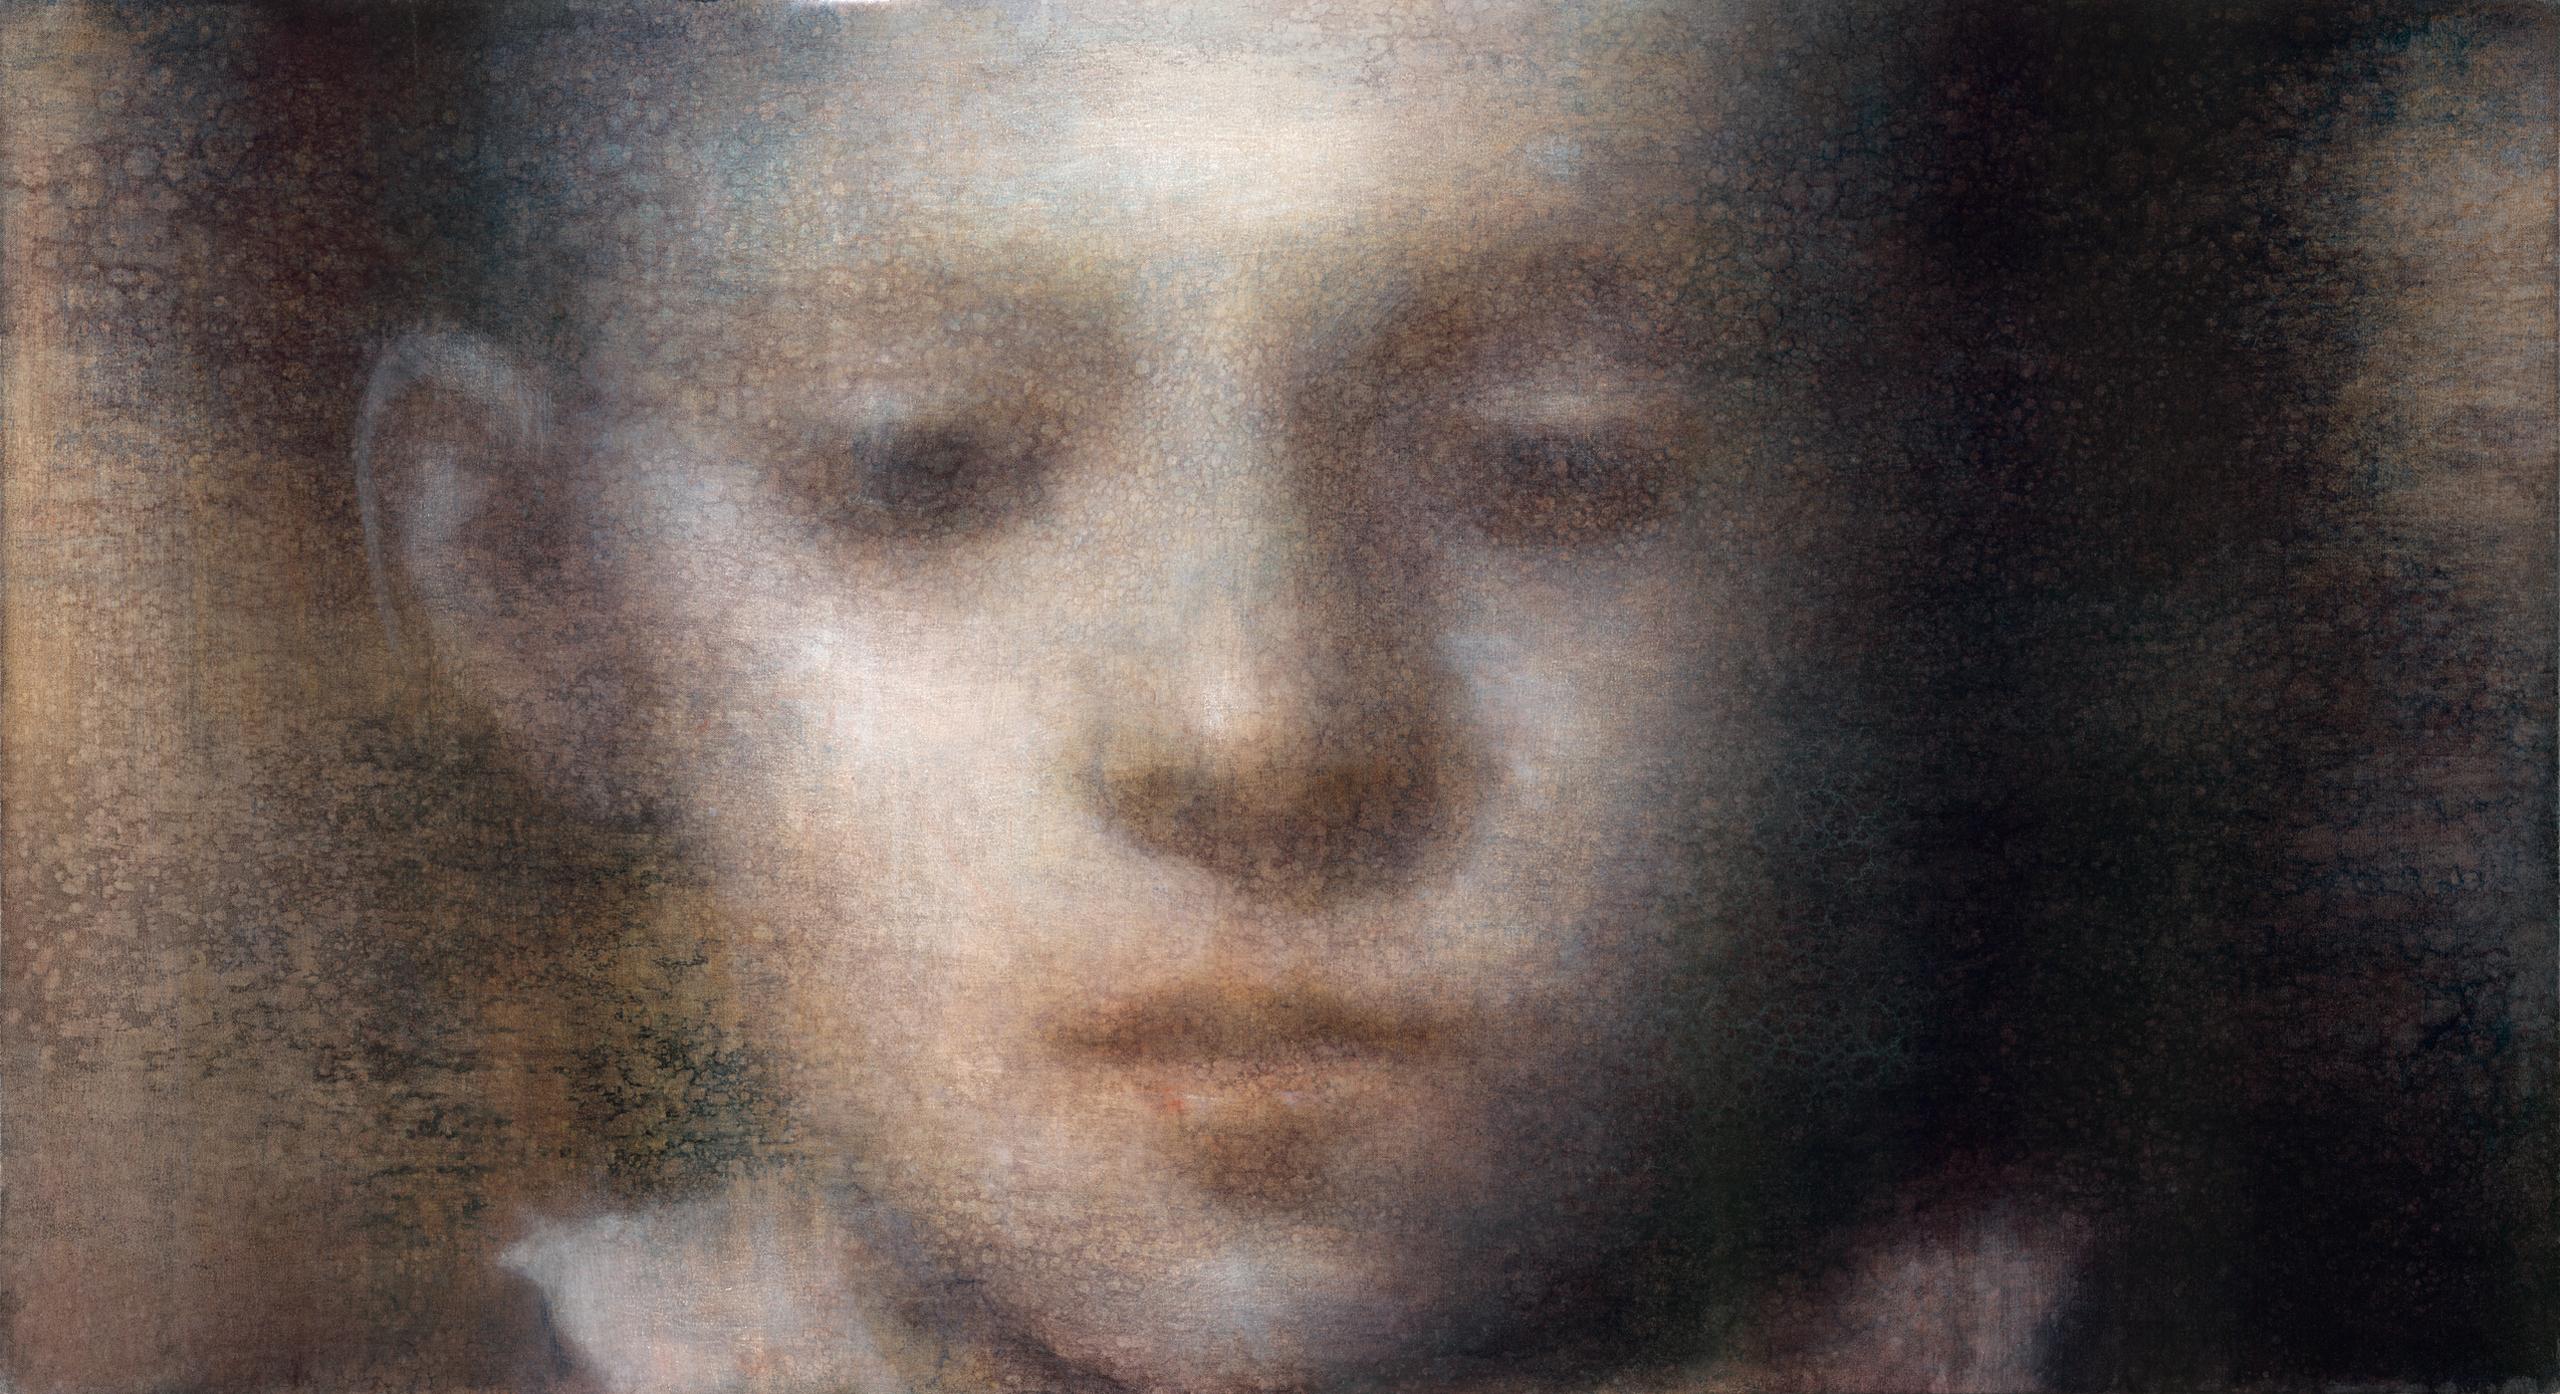 "Maya Kulenovic: BOY WITH WINDOW, 2016, oil on canvas, 37"" x 67.5"" (94cm x 171.5cm). 'Faces' Series."